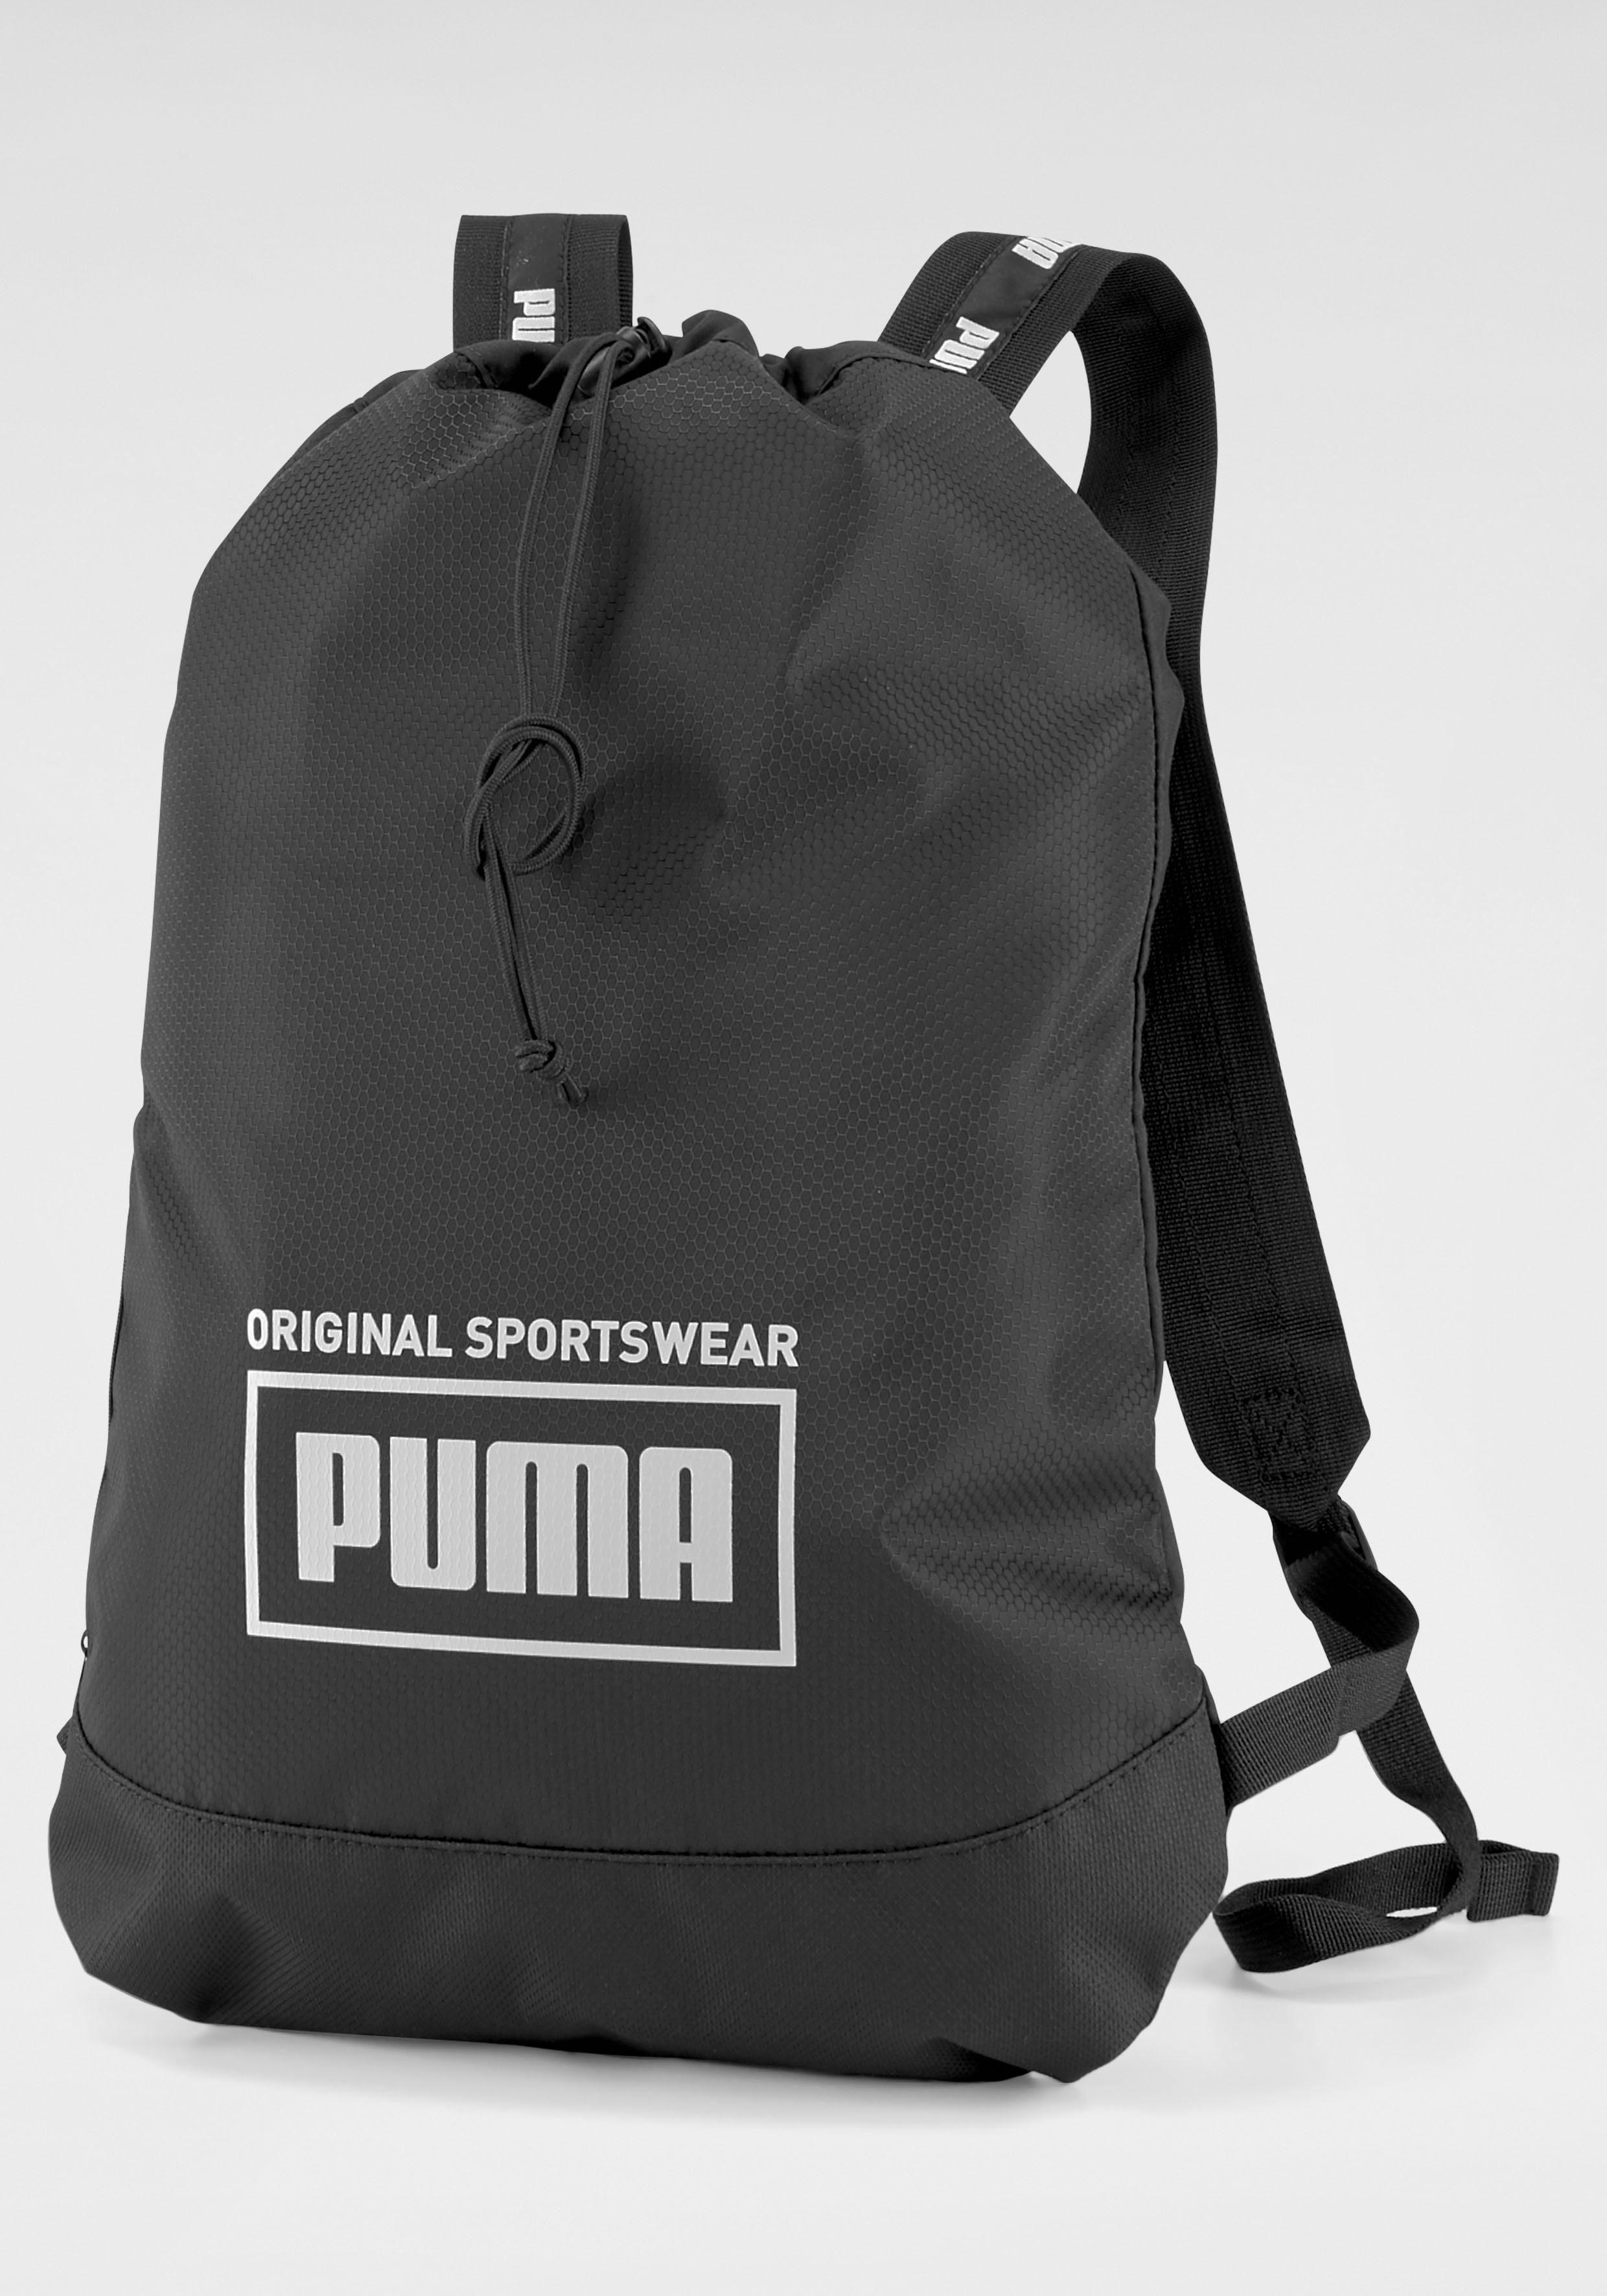 Unisex PUMA Sportrucksack »PUMA Sole Smart Bag« grau, schwarz   04062449830965